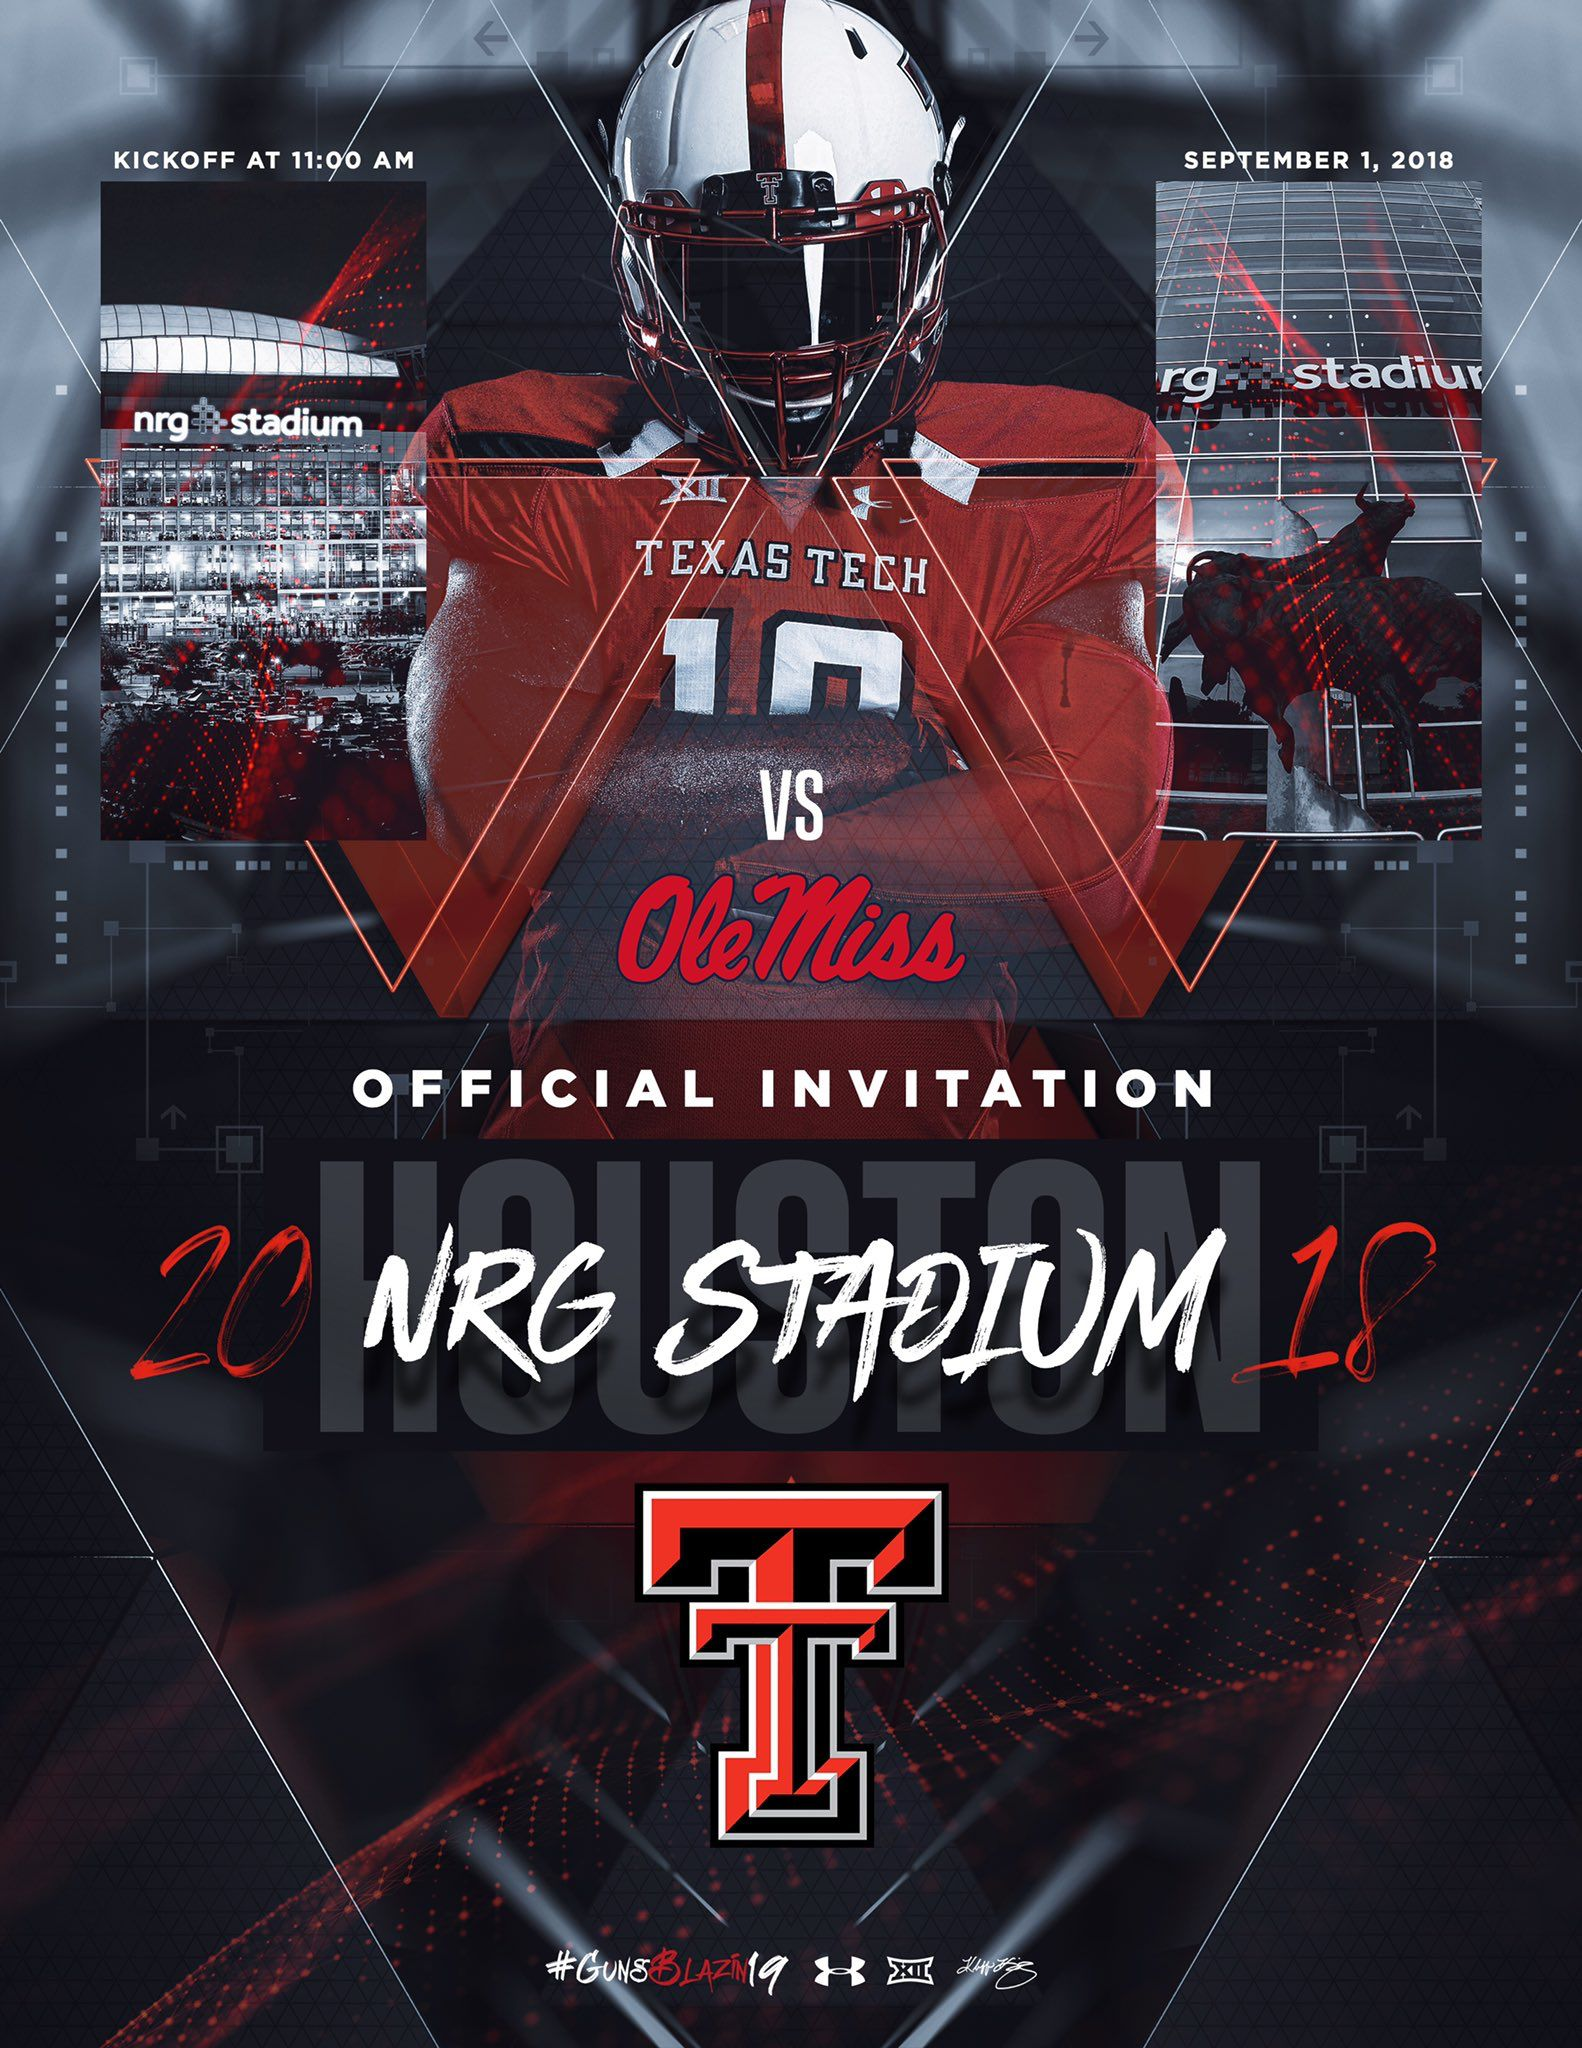 Pin by 이레 이 on sports graphic Nrg stadium, Texas tech